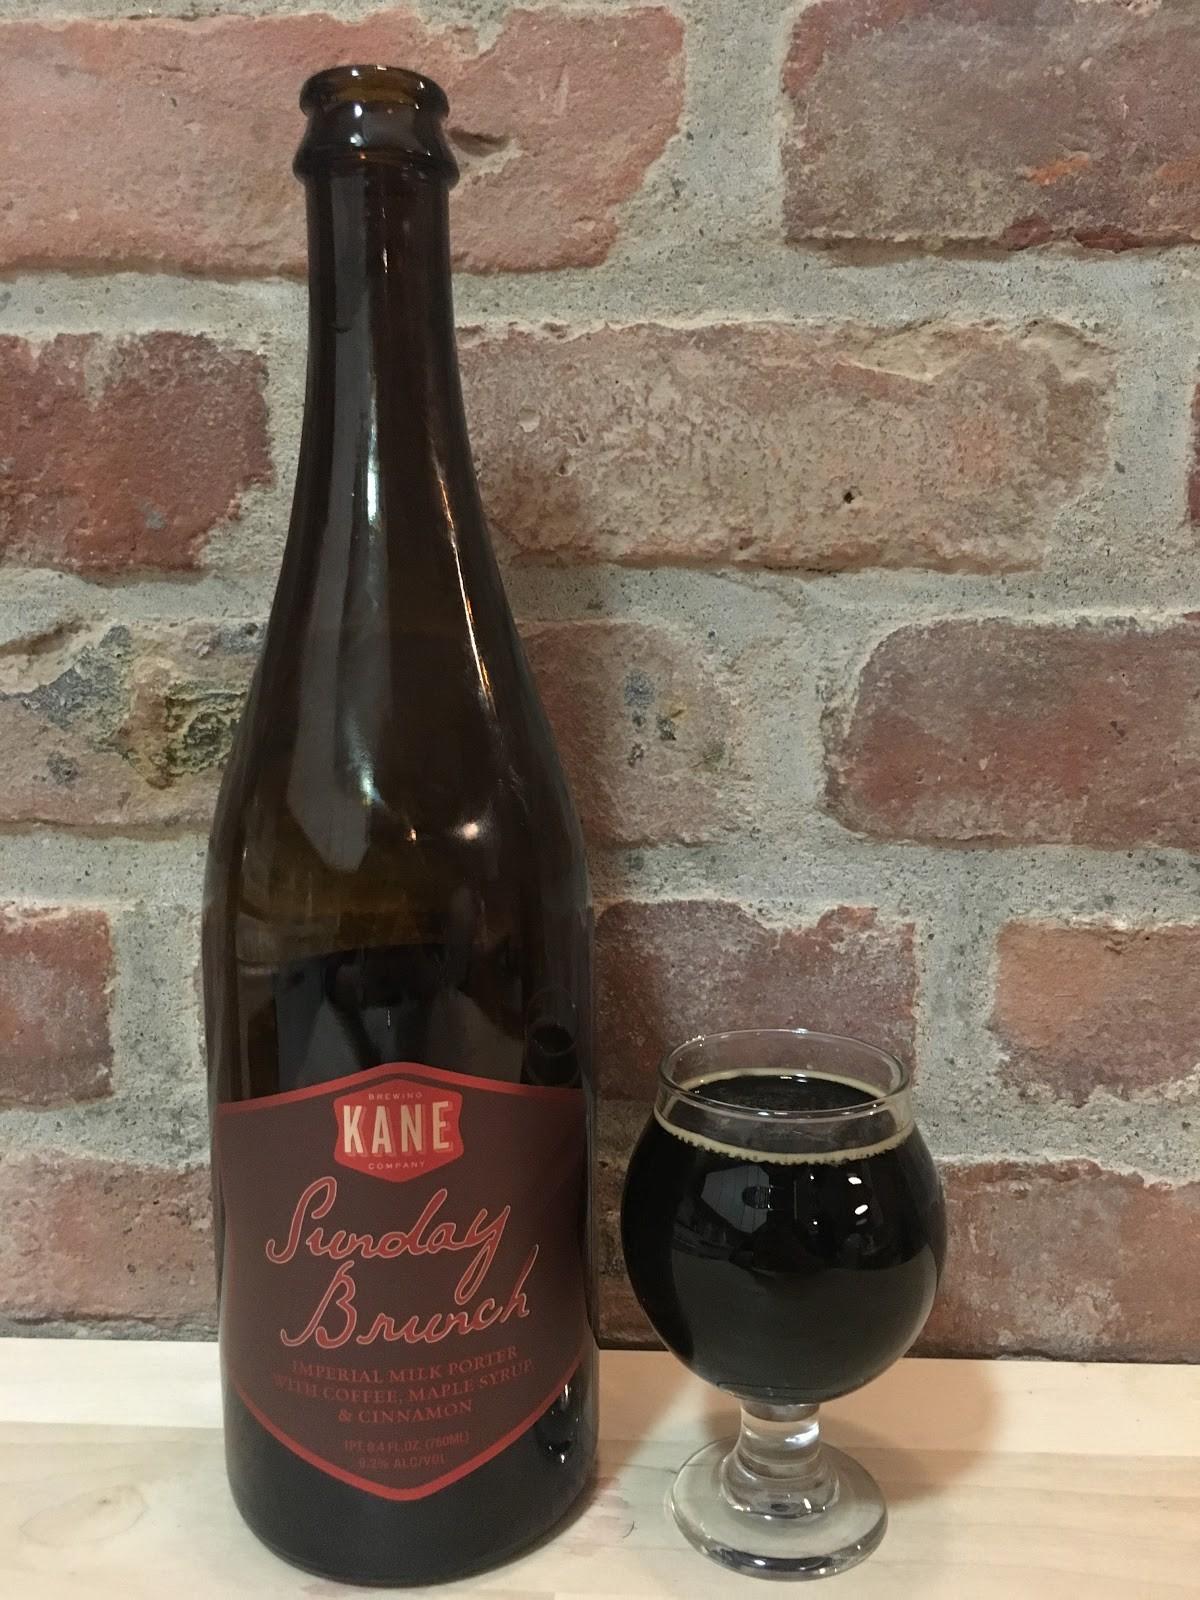 3. Kane Brewing - Sunday Brunch